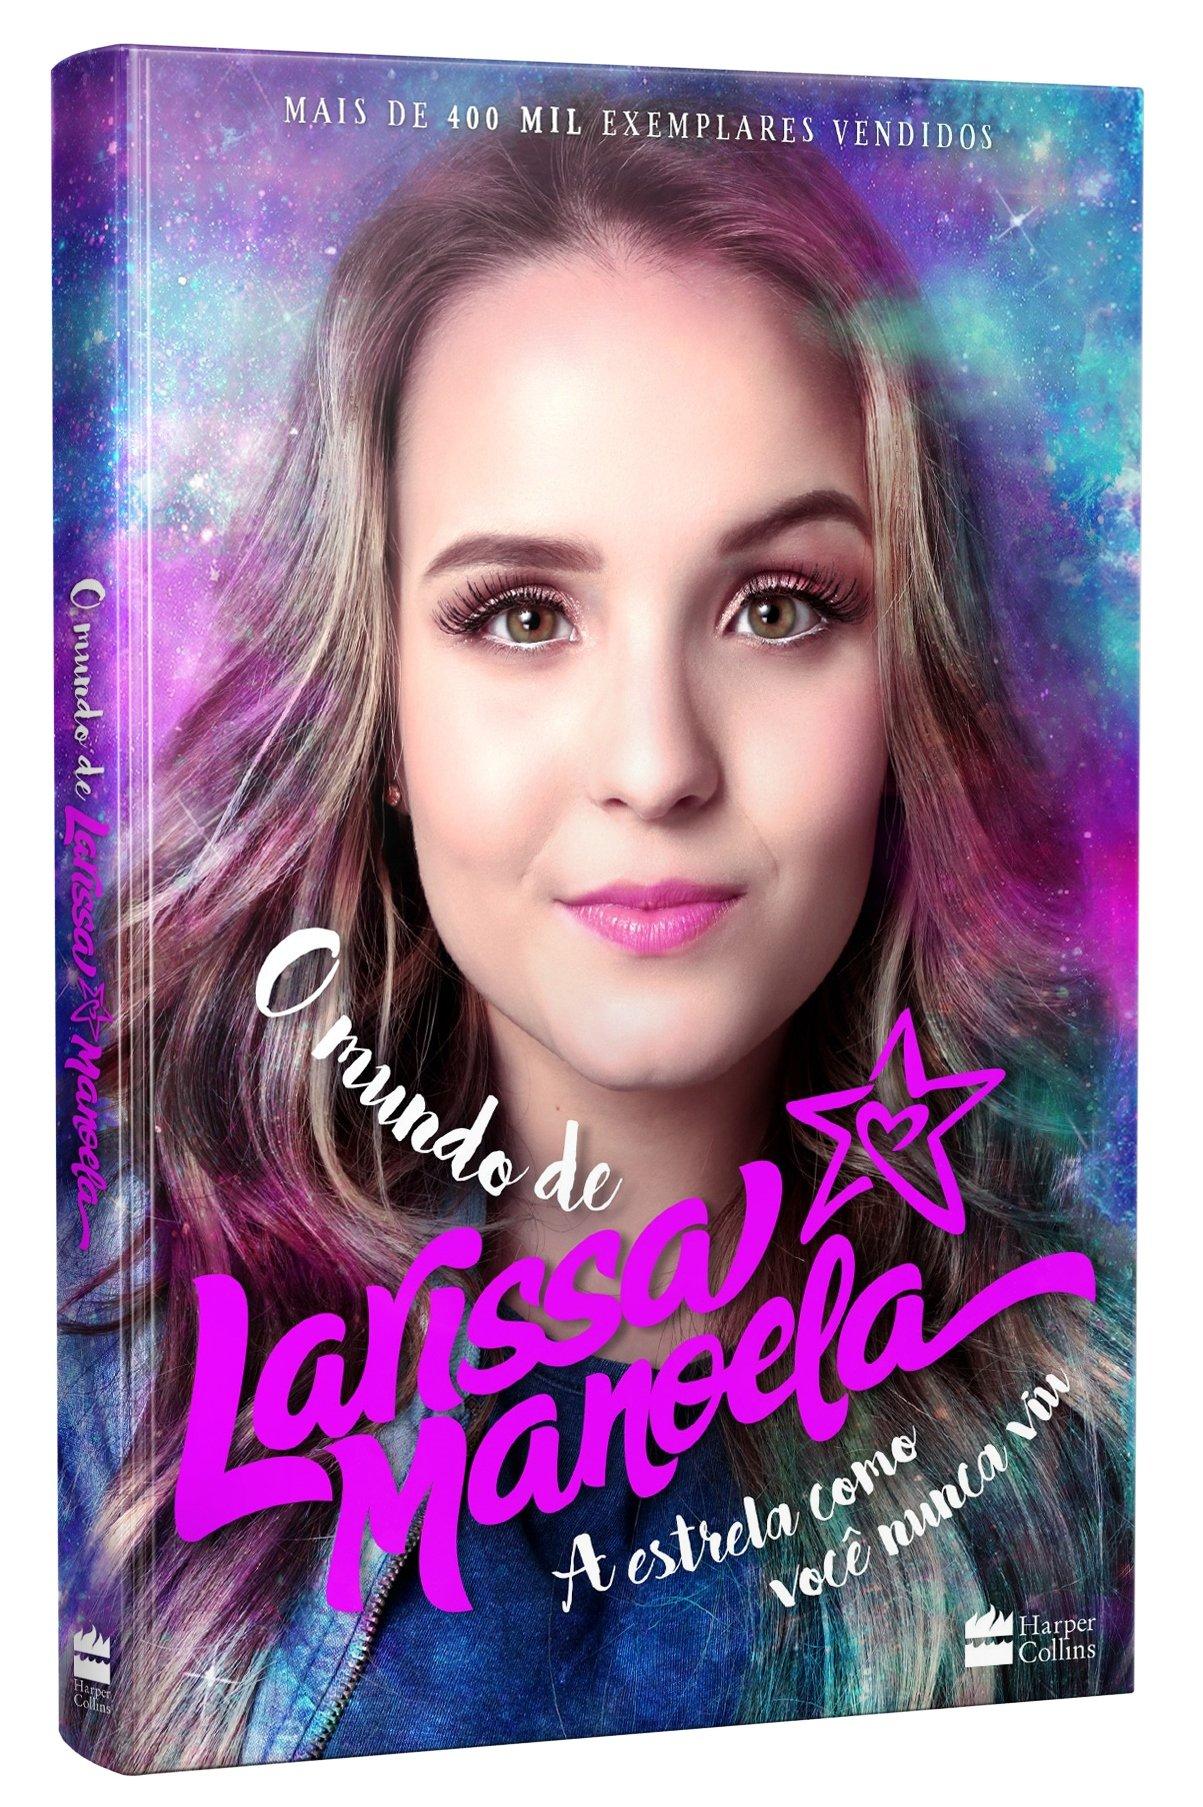 O Mundo de Larissa Manoela (Em Portuguese do Brasil): Amazon.es: Larissa Manoela: Libros